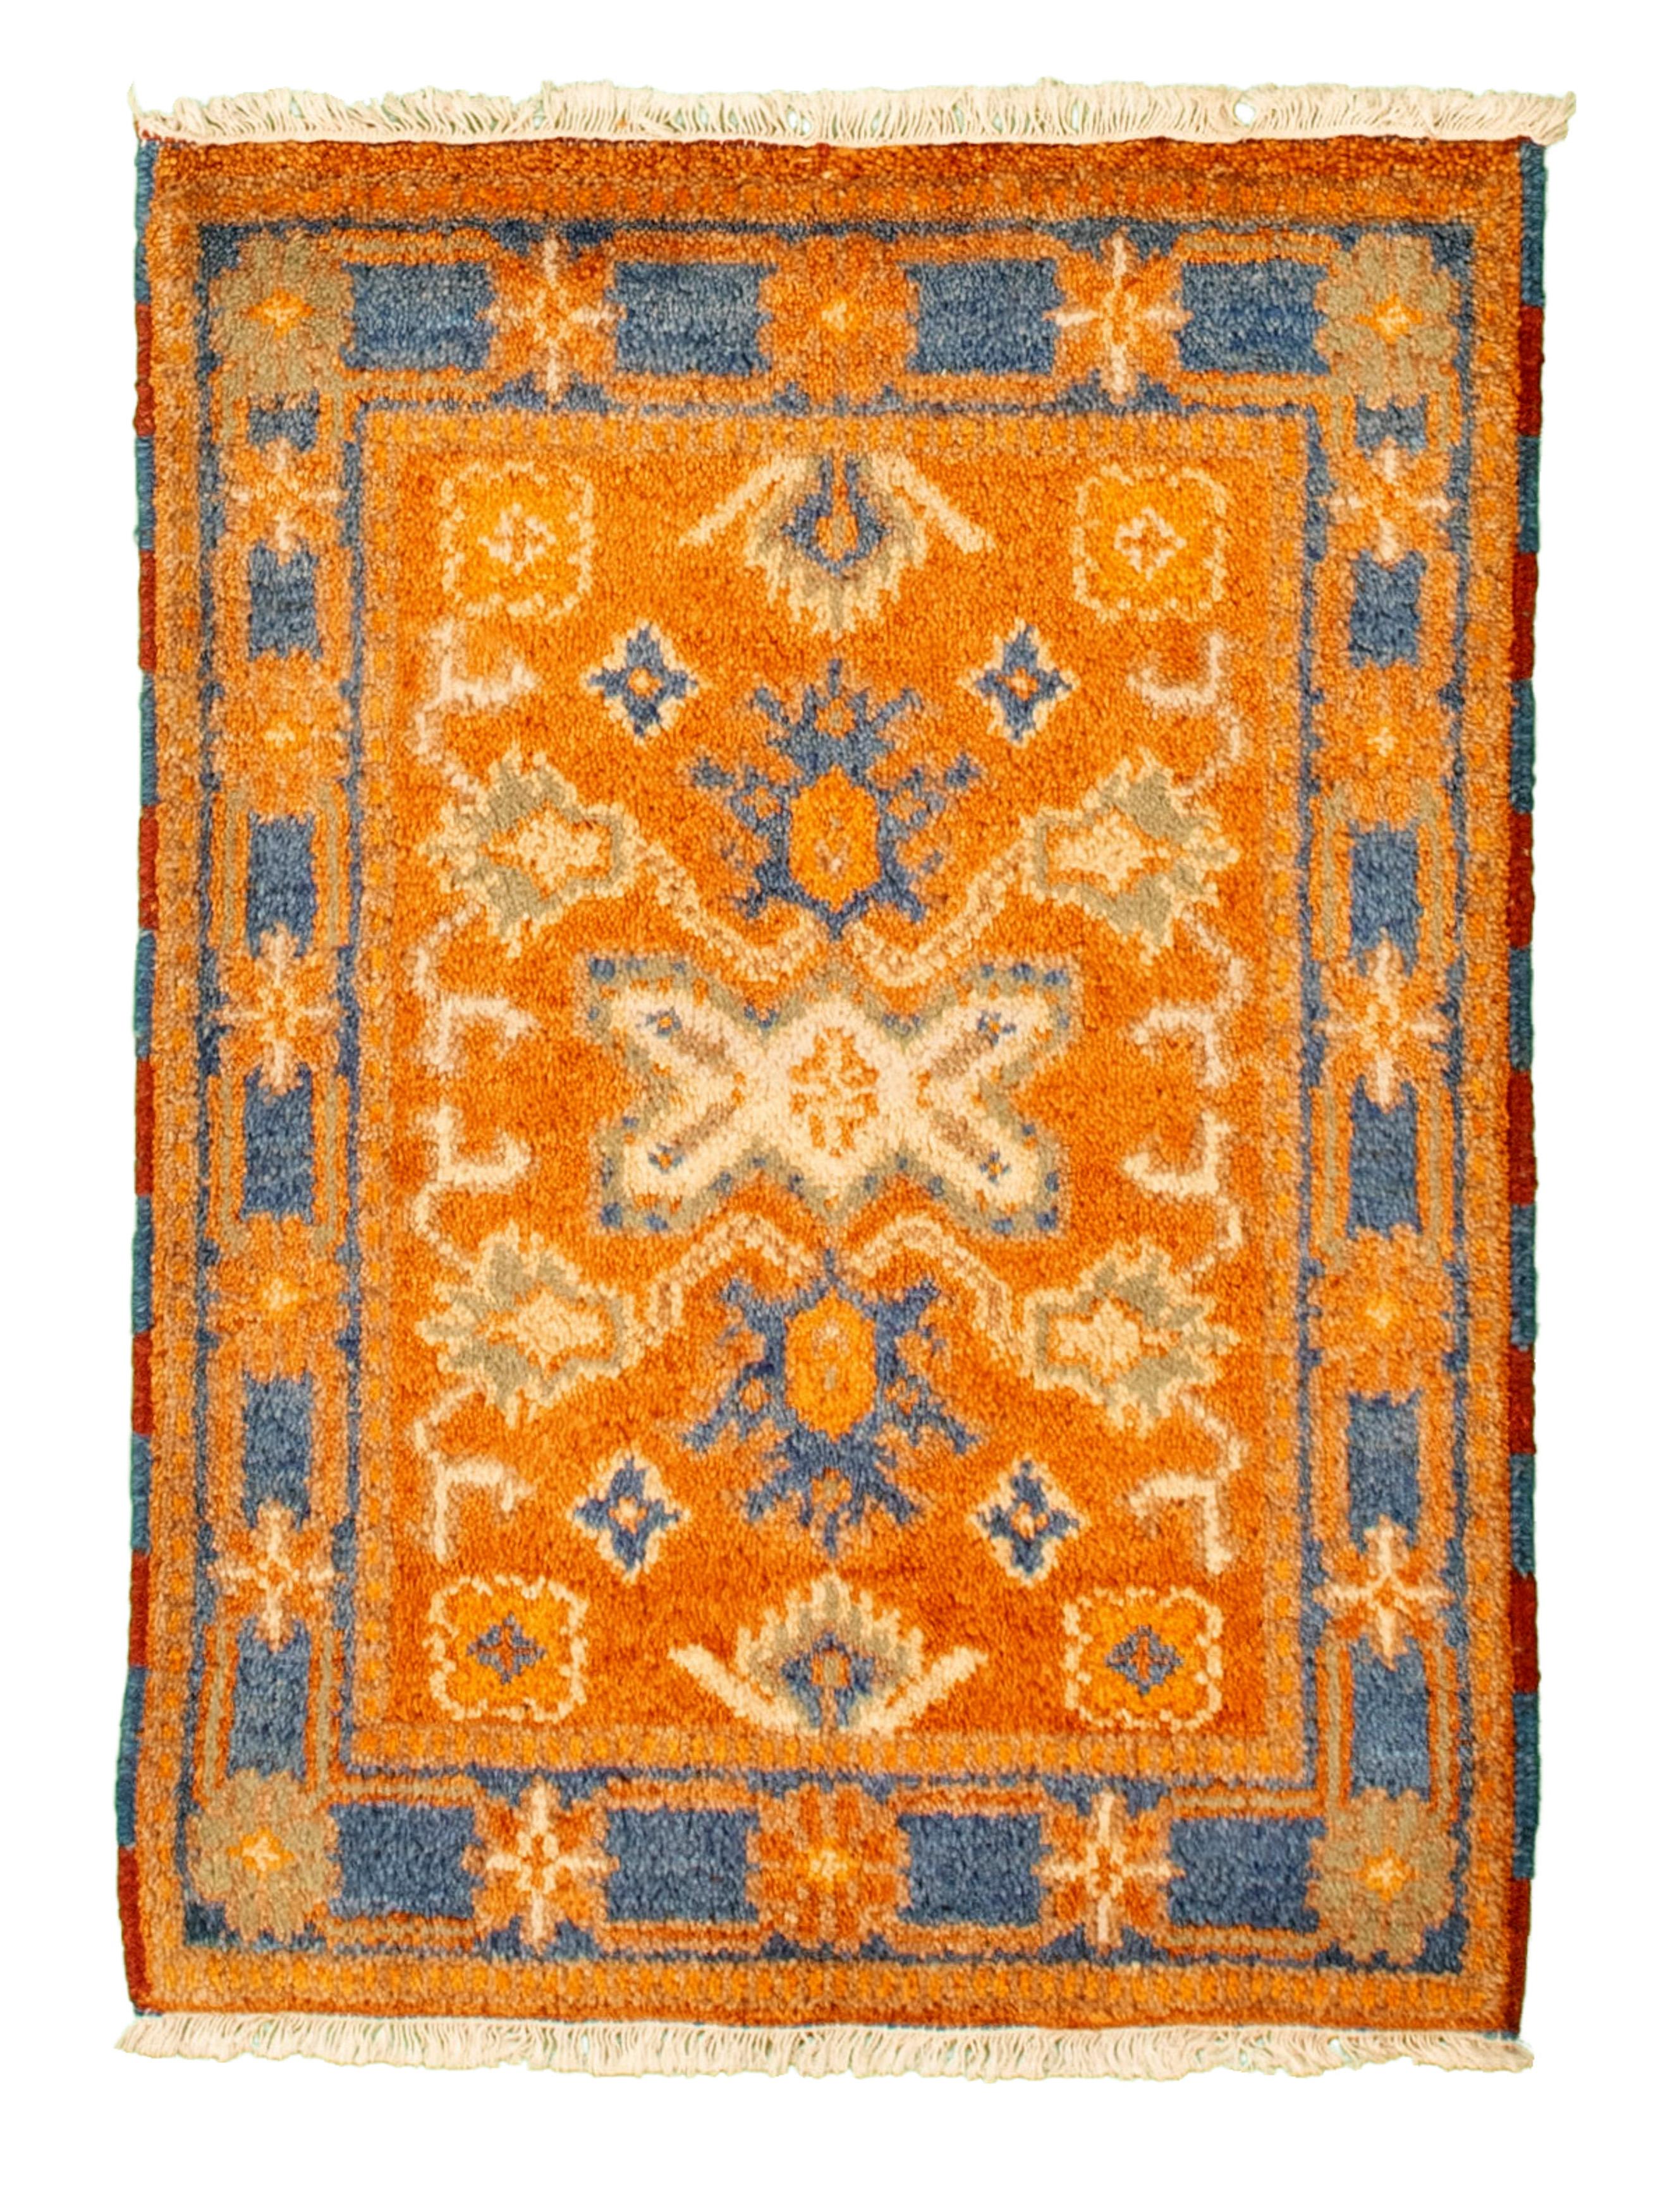 "Hand-knotted Royal Kazak Burnt Orange Cotton Rug 2'1"" x 3'0""  Size: 2'1"" x 3'0"""